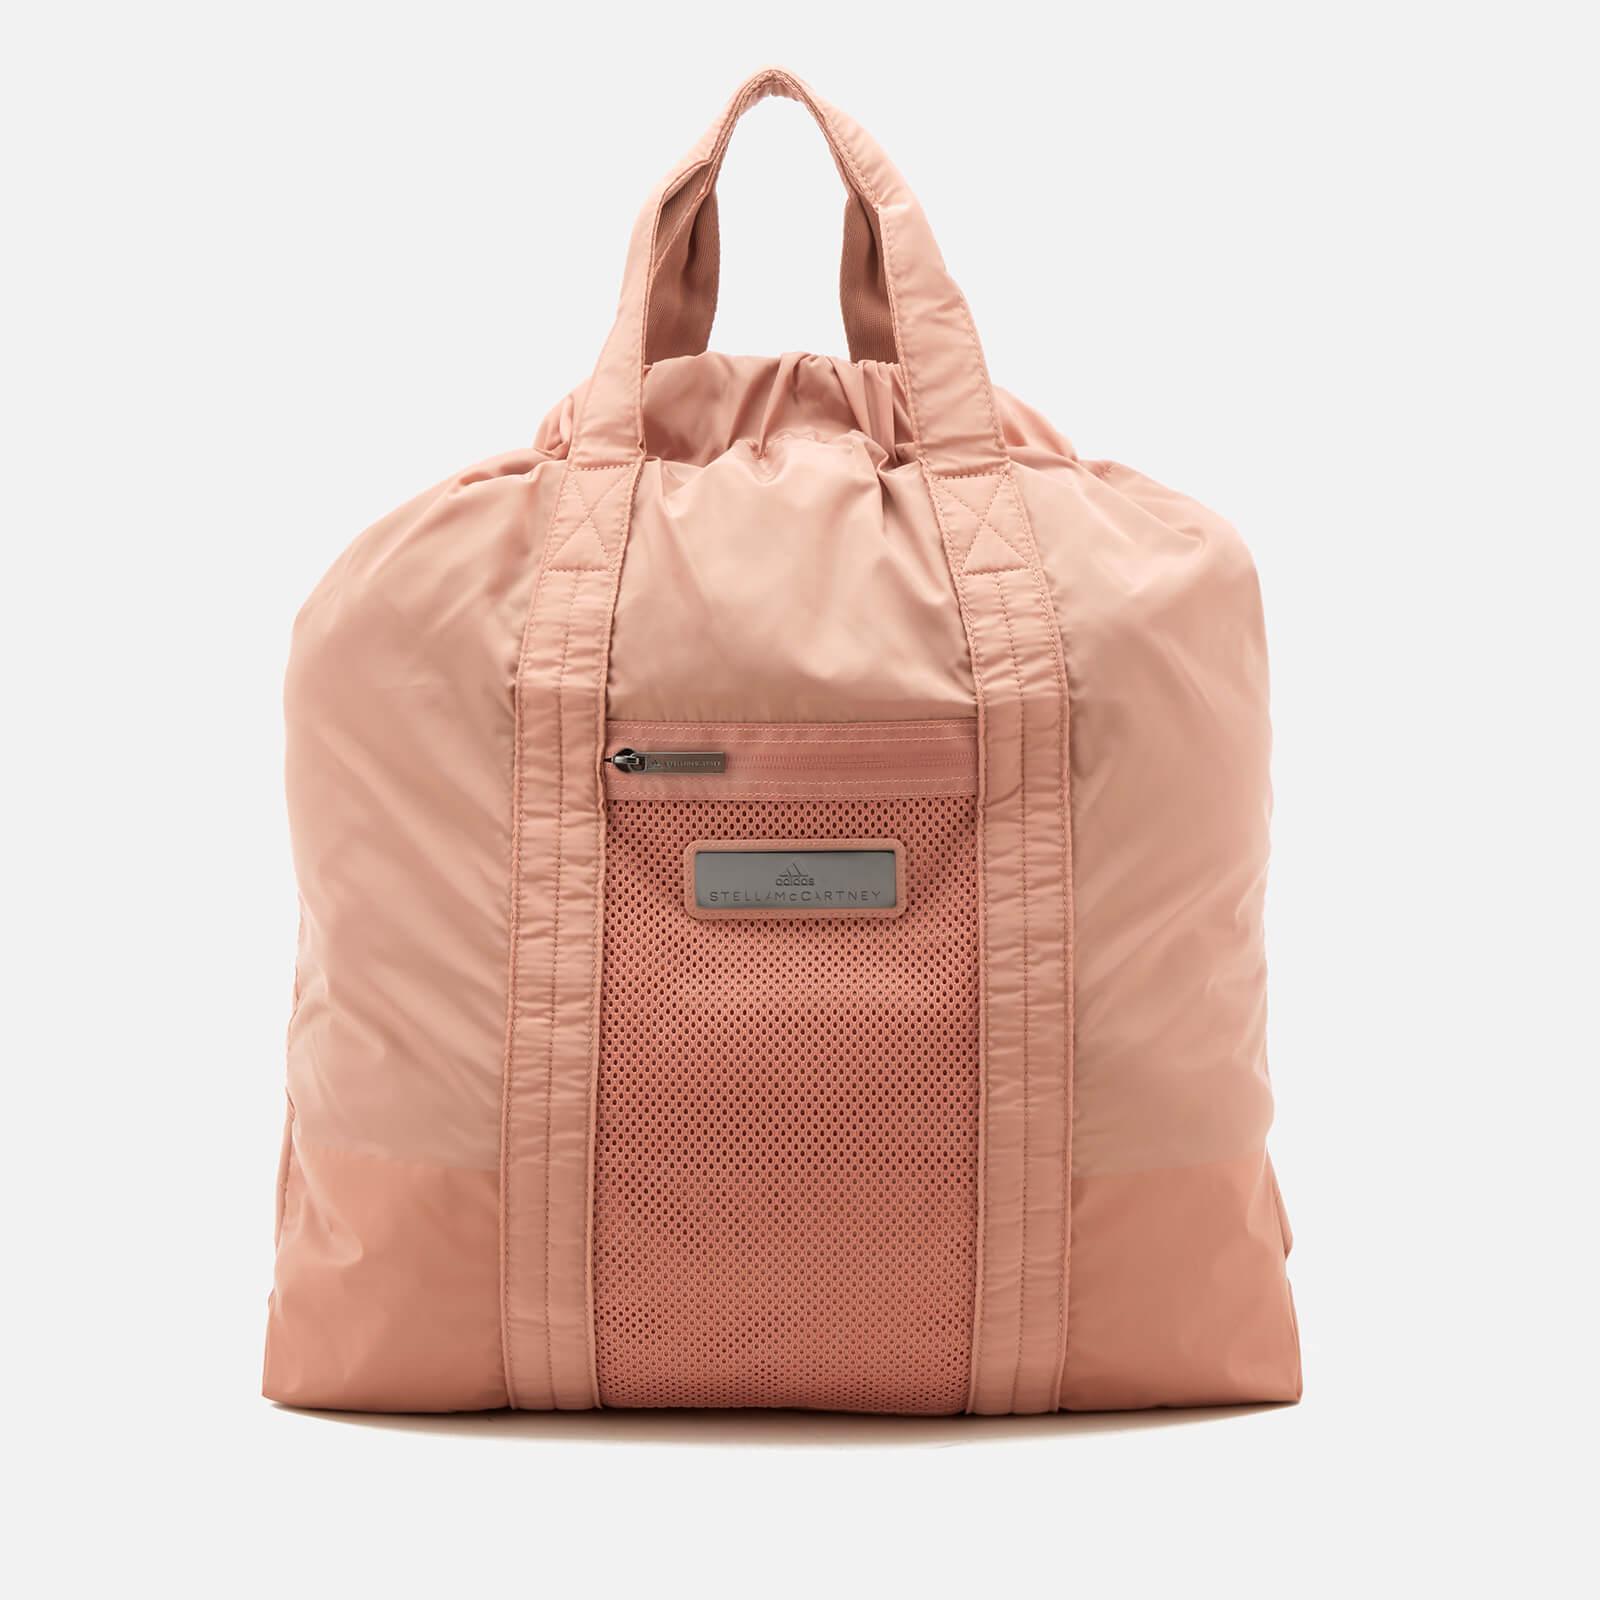 f6bc44e473 adidas by Stella McCartney Women s Gym Sack Bag - Cinnamon Blush Black Ice  Grey - Free UK Delivery over £50